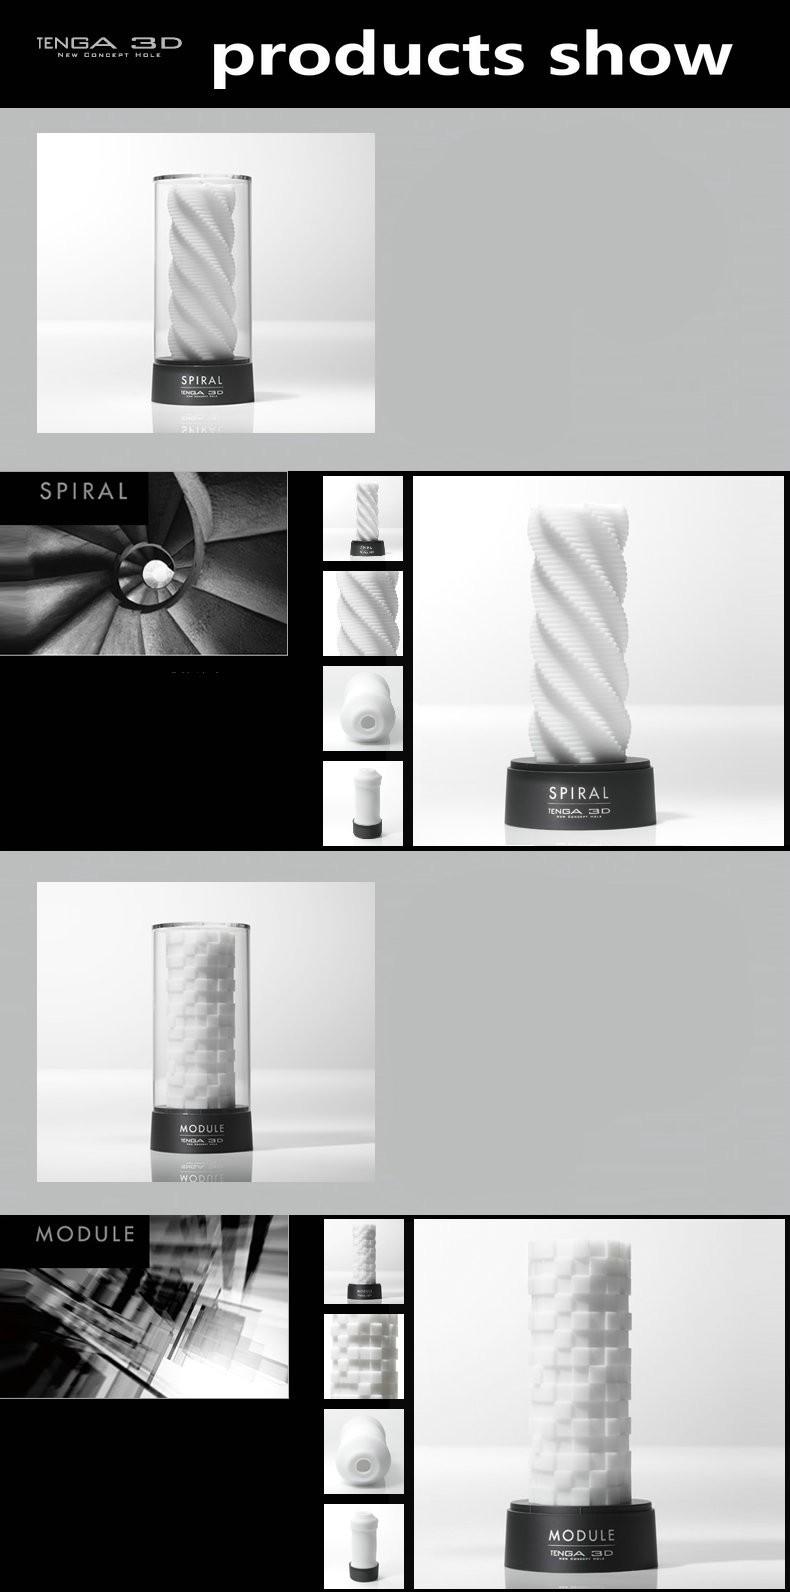 TENGA 3D Male Masturbator Adult Male Sex Tools Japan's Original Masturbation Cup Sex Toys for Men Artificial Vagina Sex Products 2